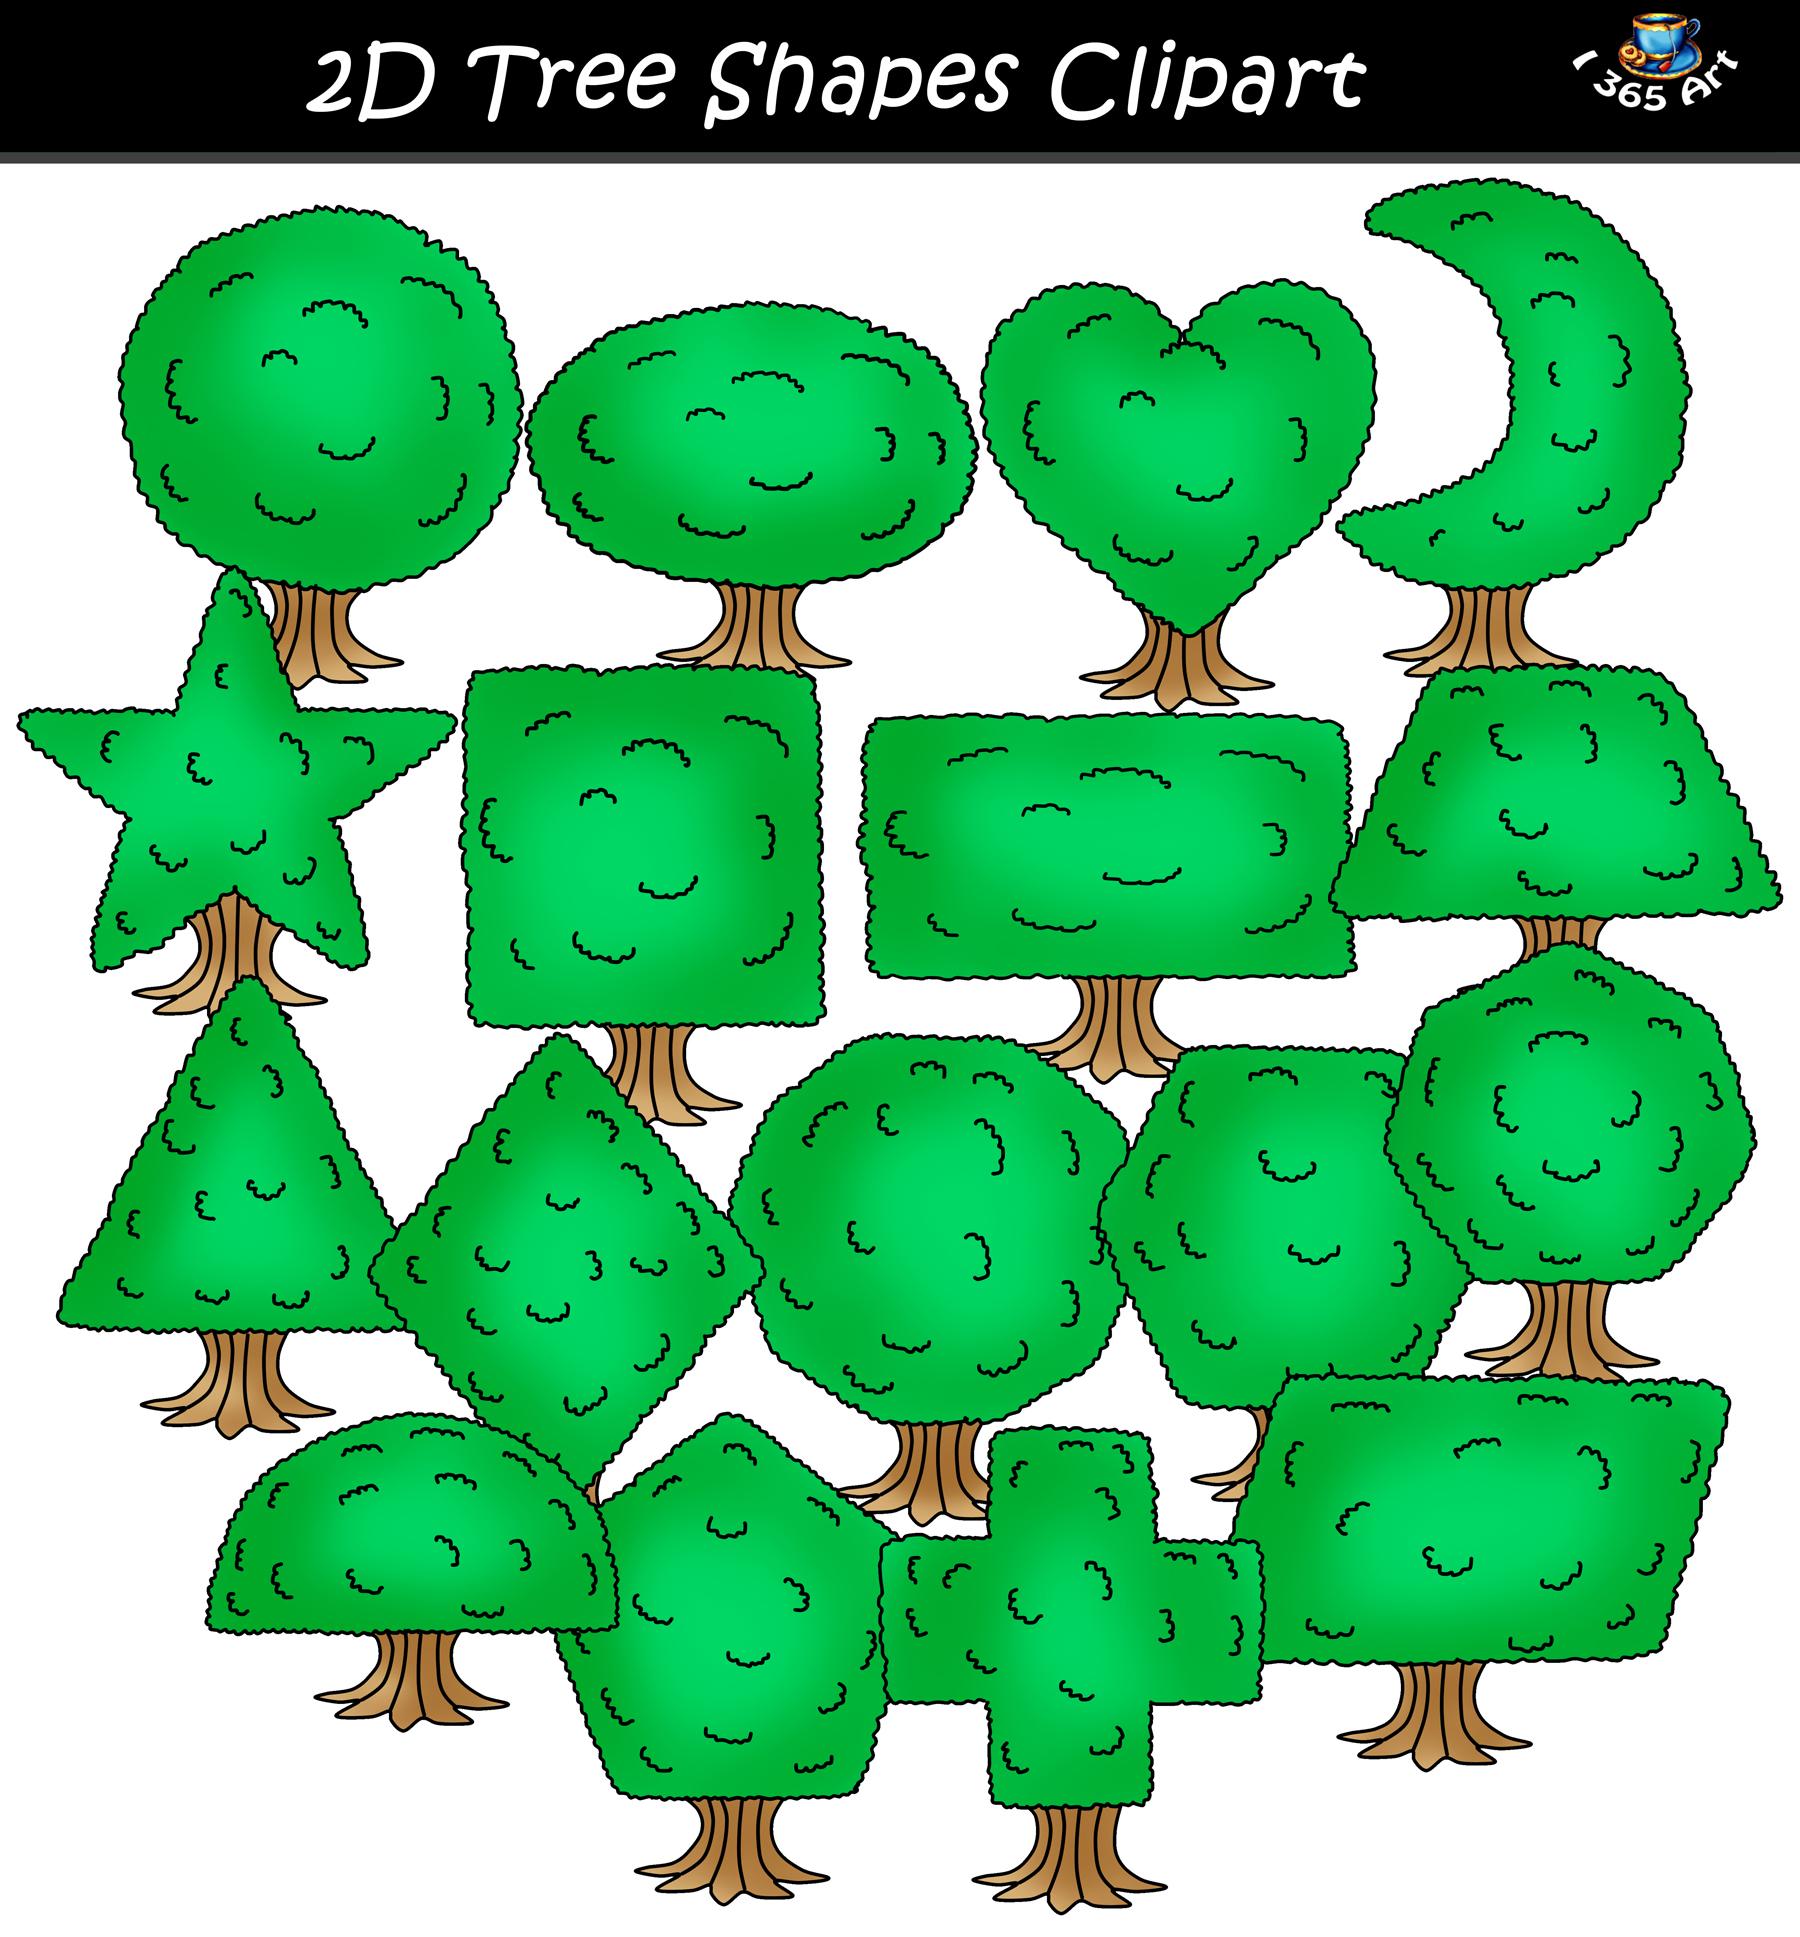 d shapes graphics. Tree clipart shape